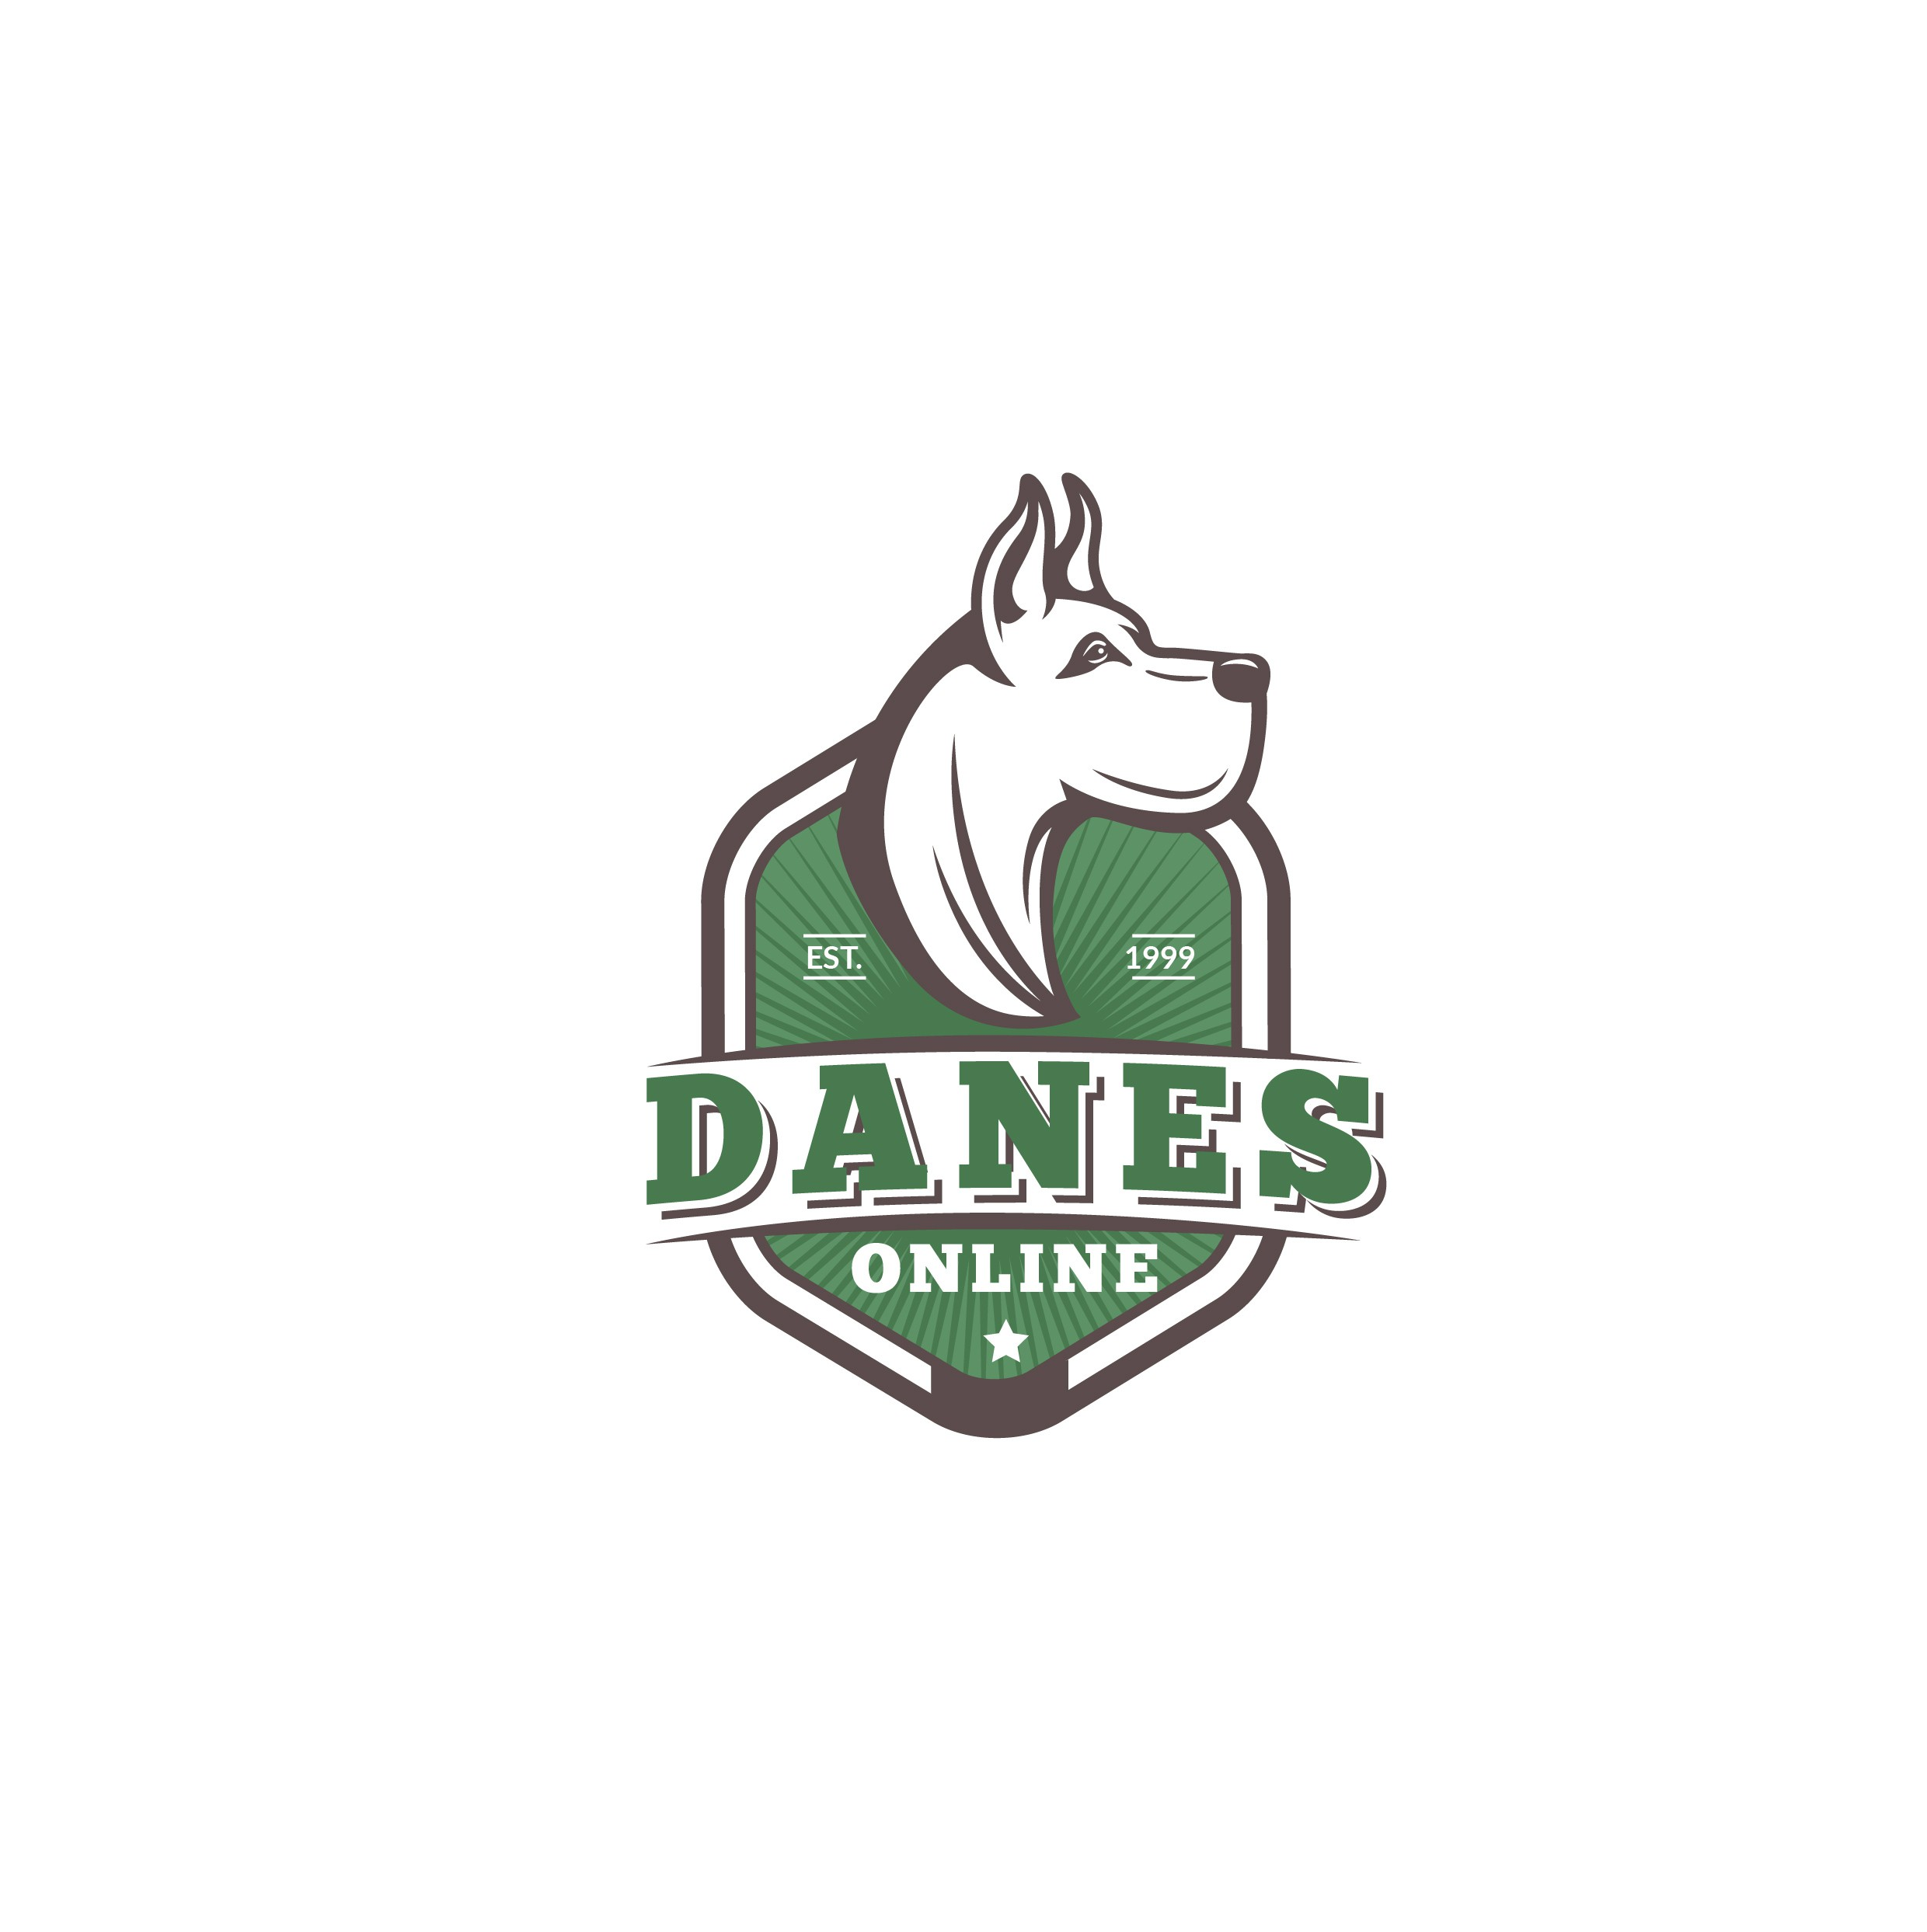 Build A Stellar Danes Online (Great Dane) Logo